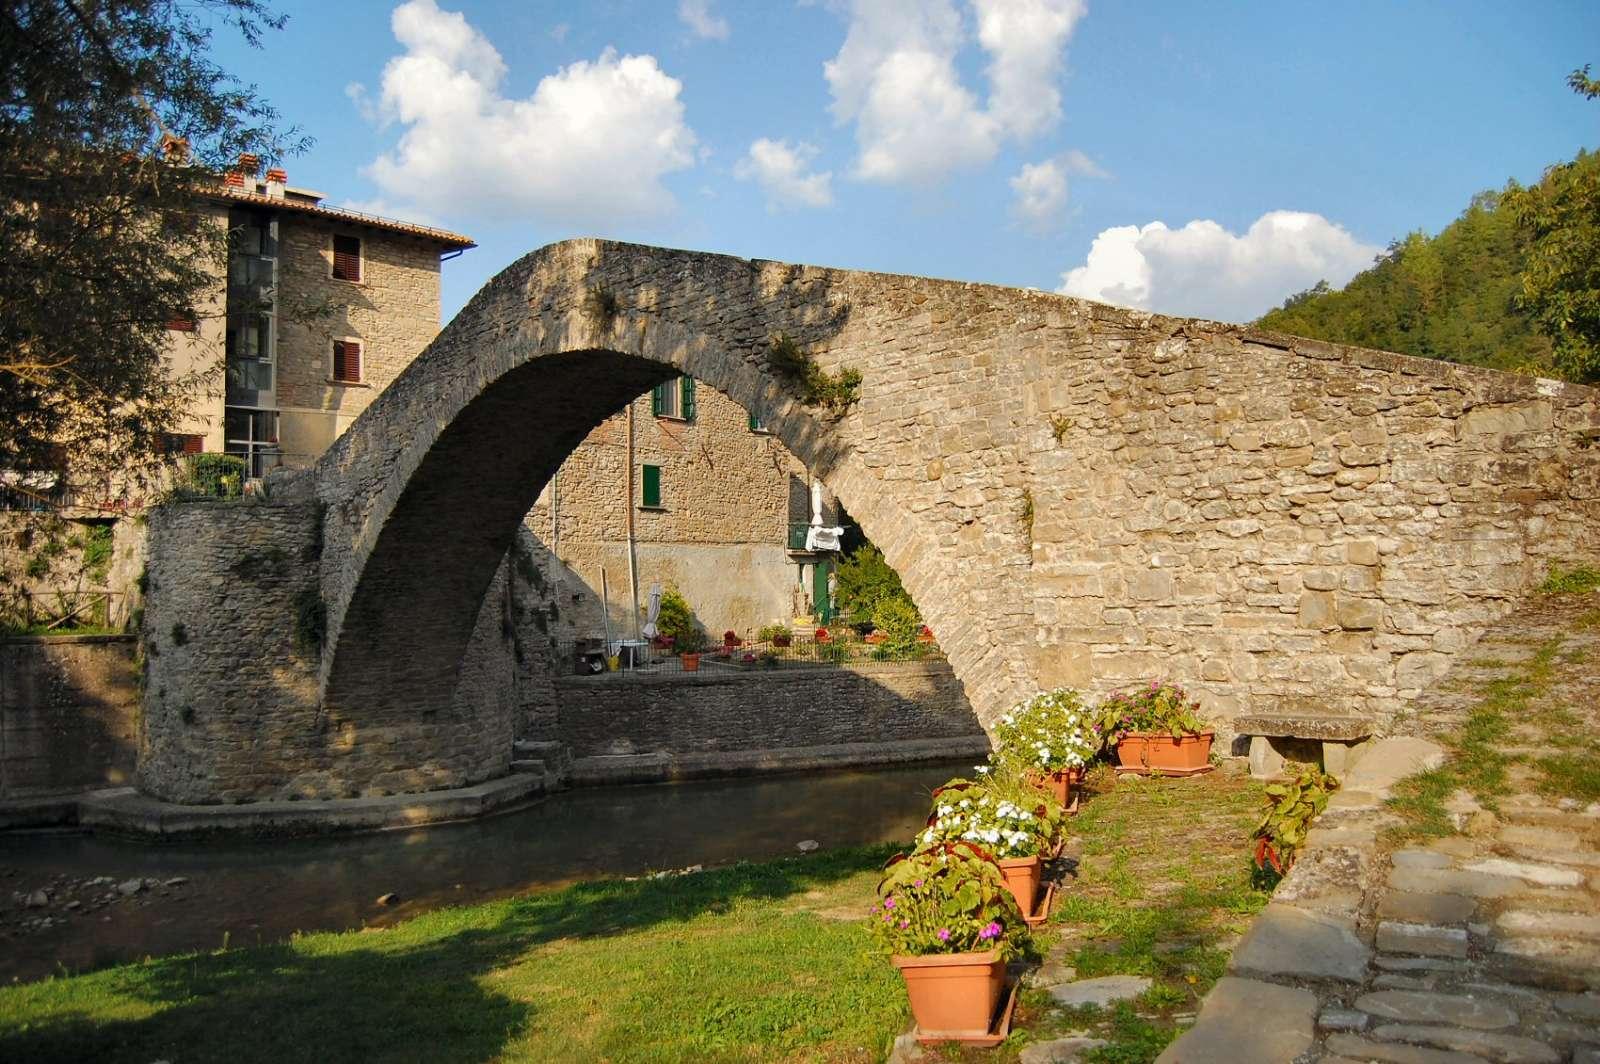 Middelalderbroen Ponte della Maestà fra 1200-tallet